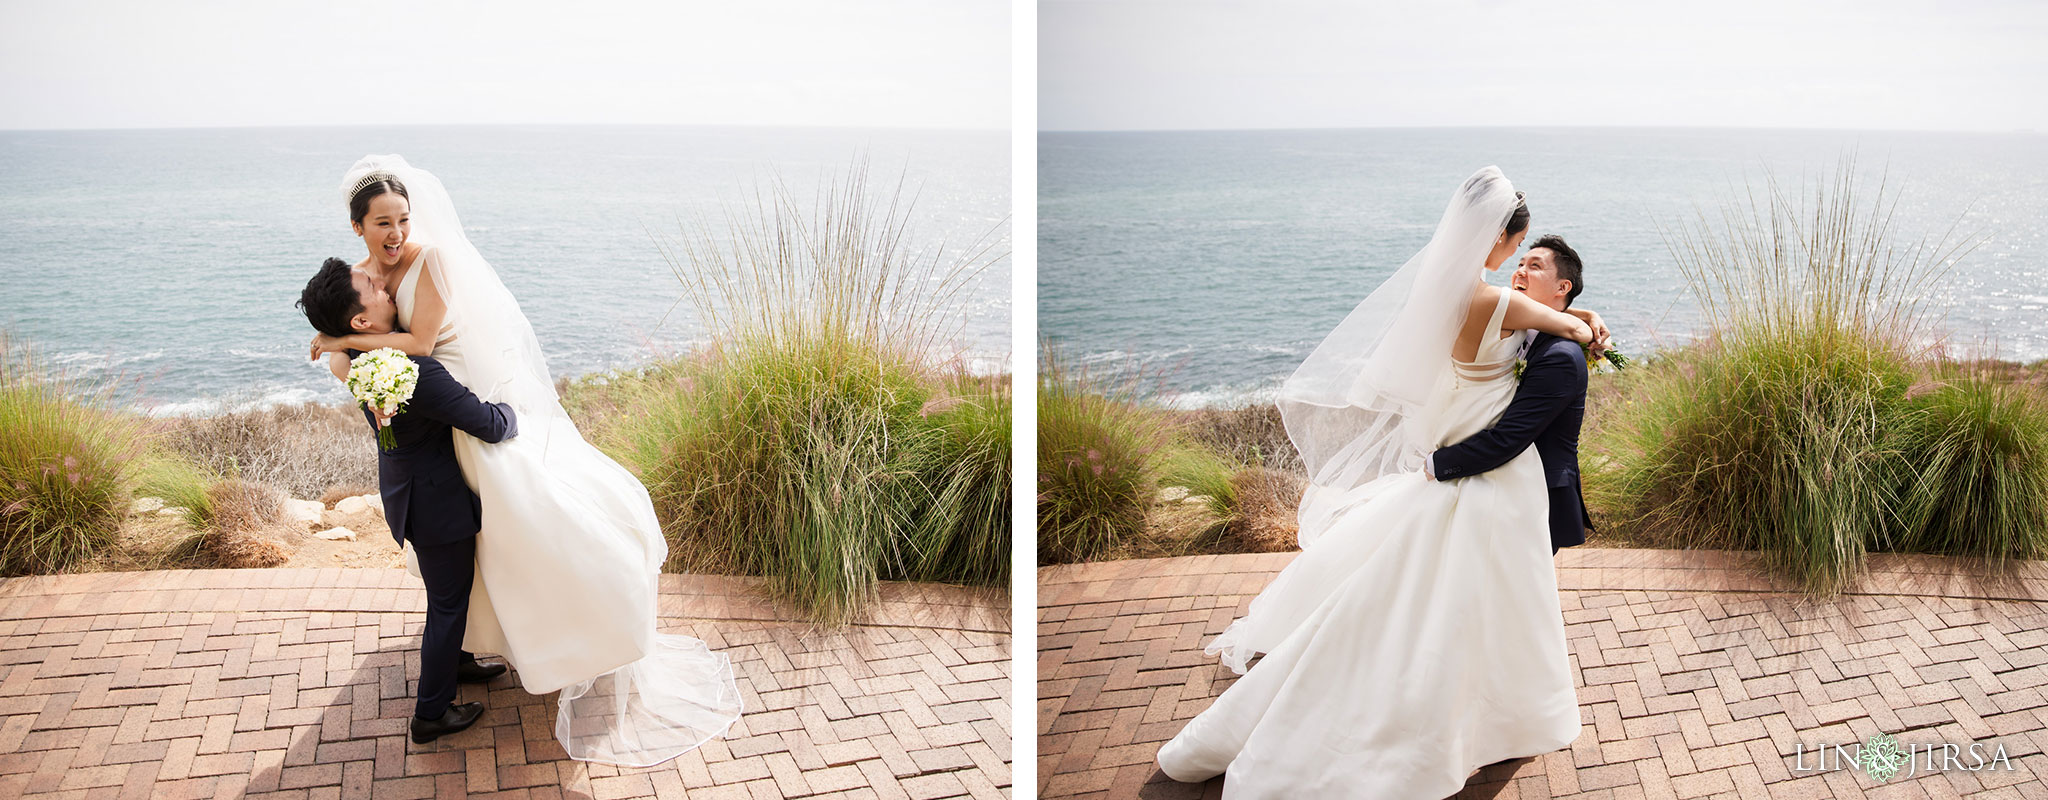 19 terannea resort palos verdes wedding photography